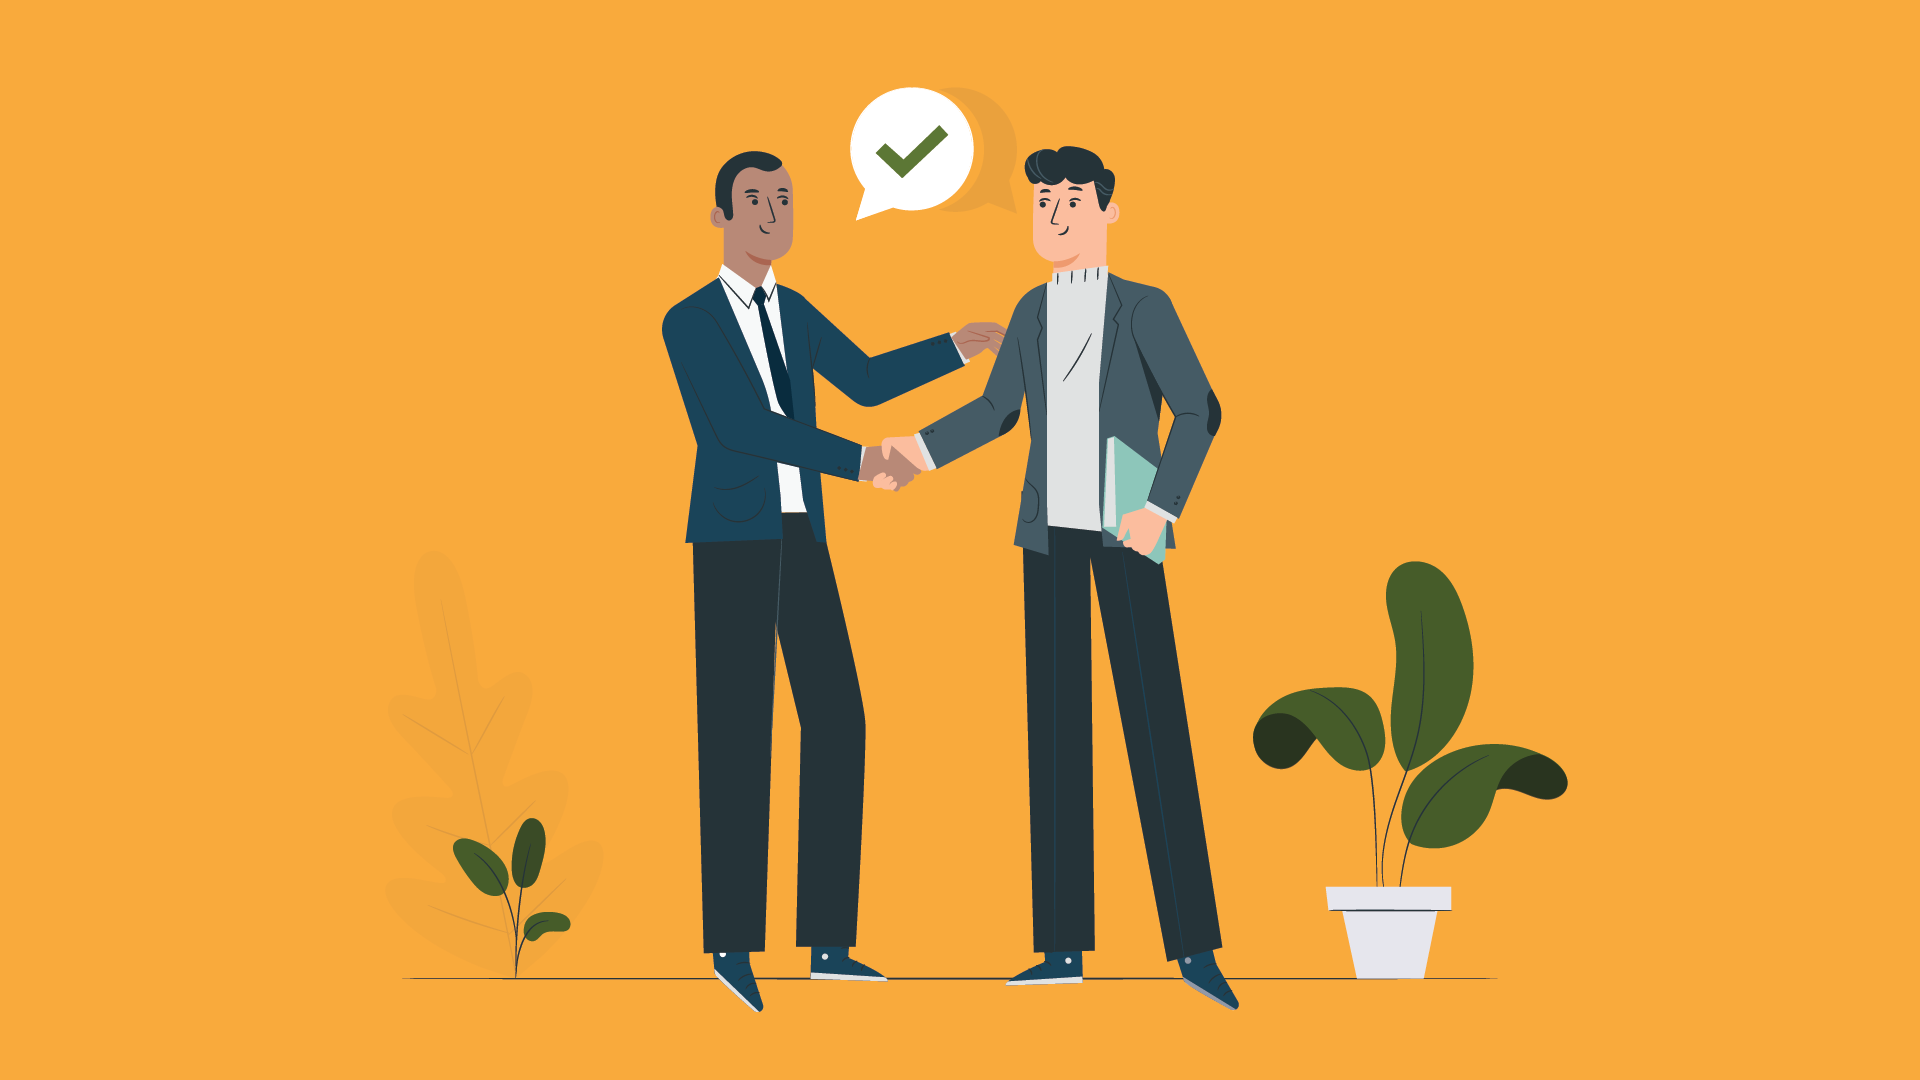 How to hire a web designer or developer